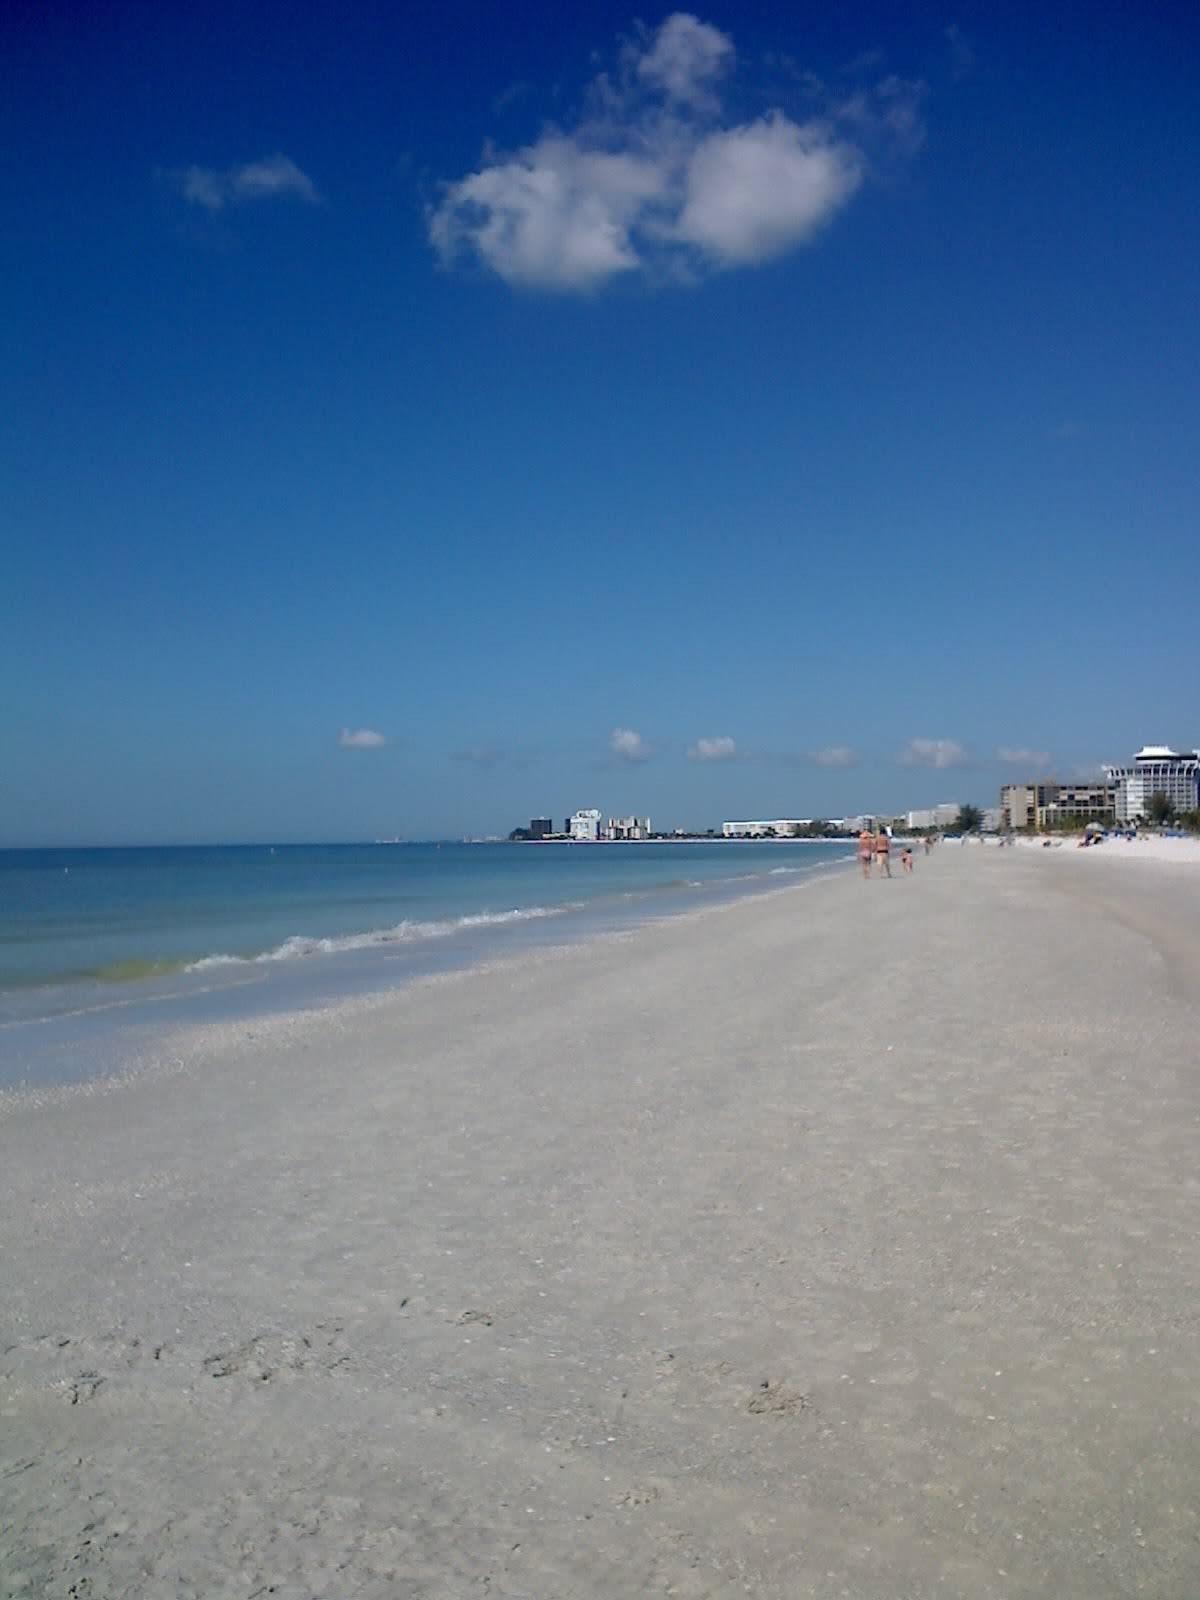 St Pete Beach Florida. We Will Meet Again Very Soon My